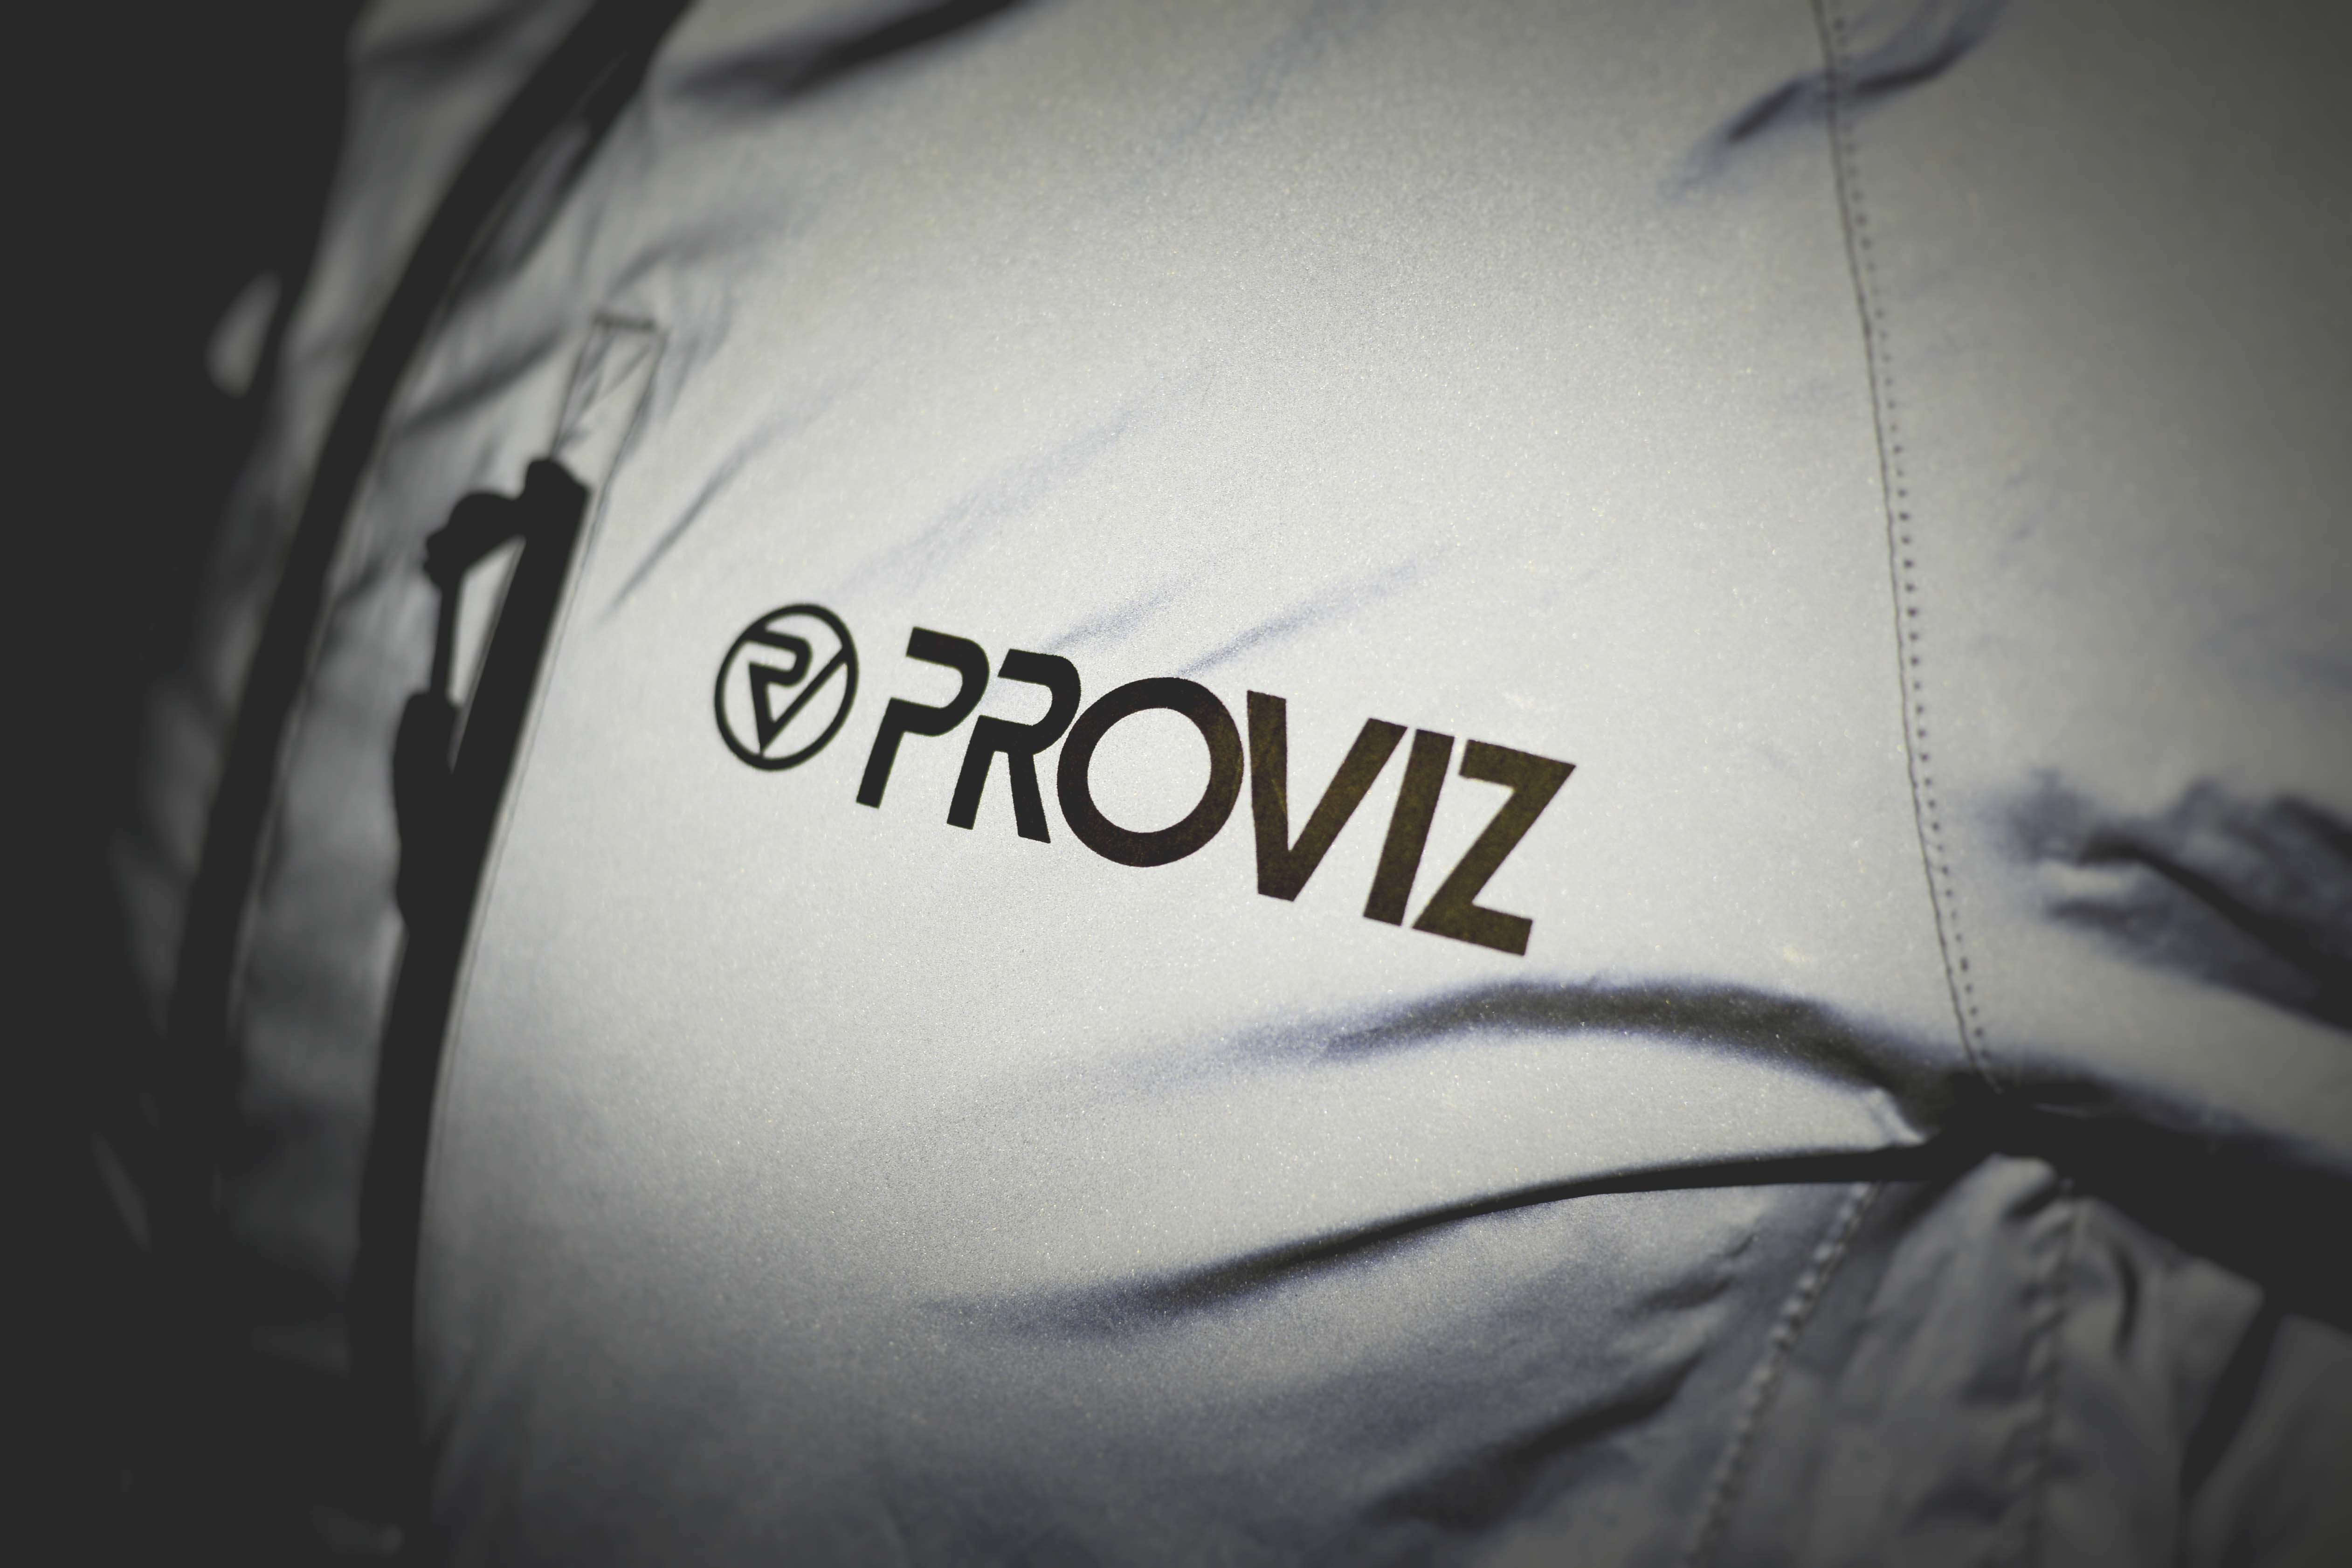 ProvizKit-0952